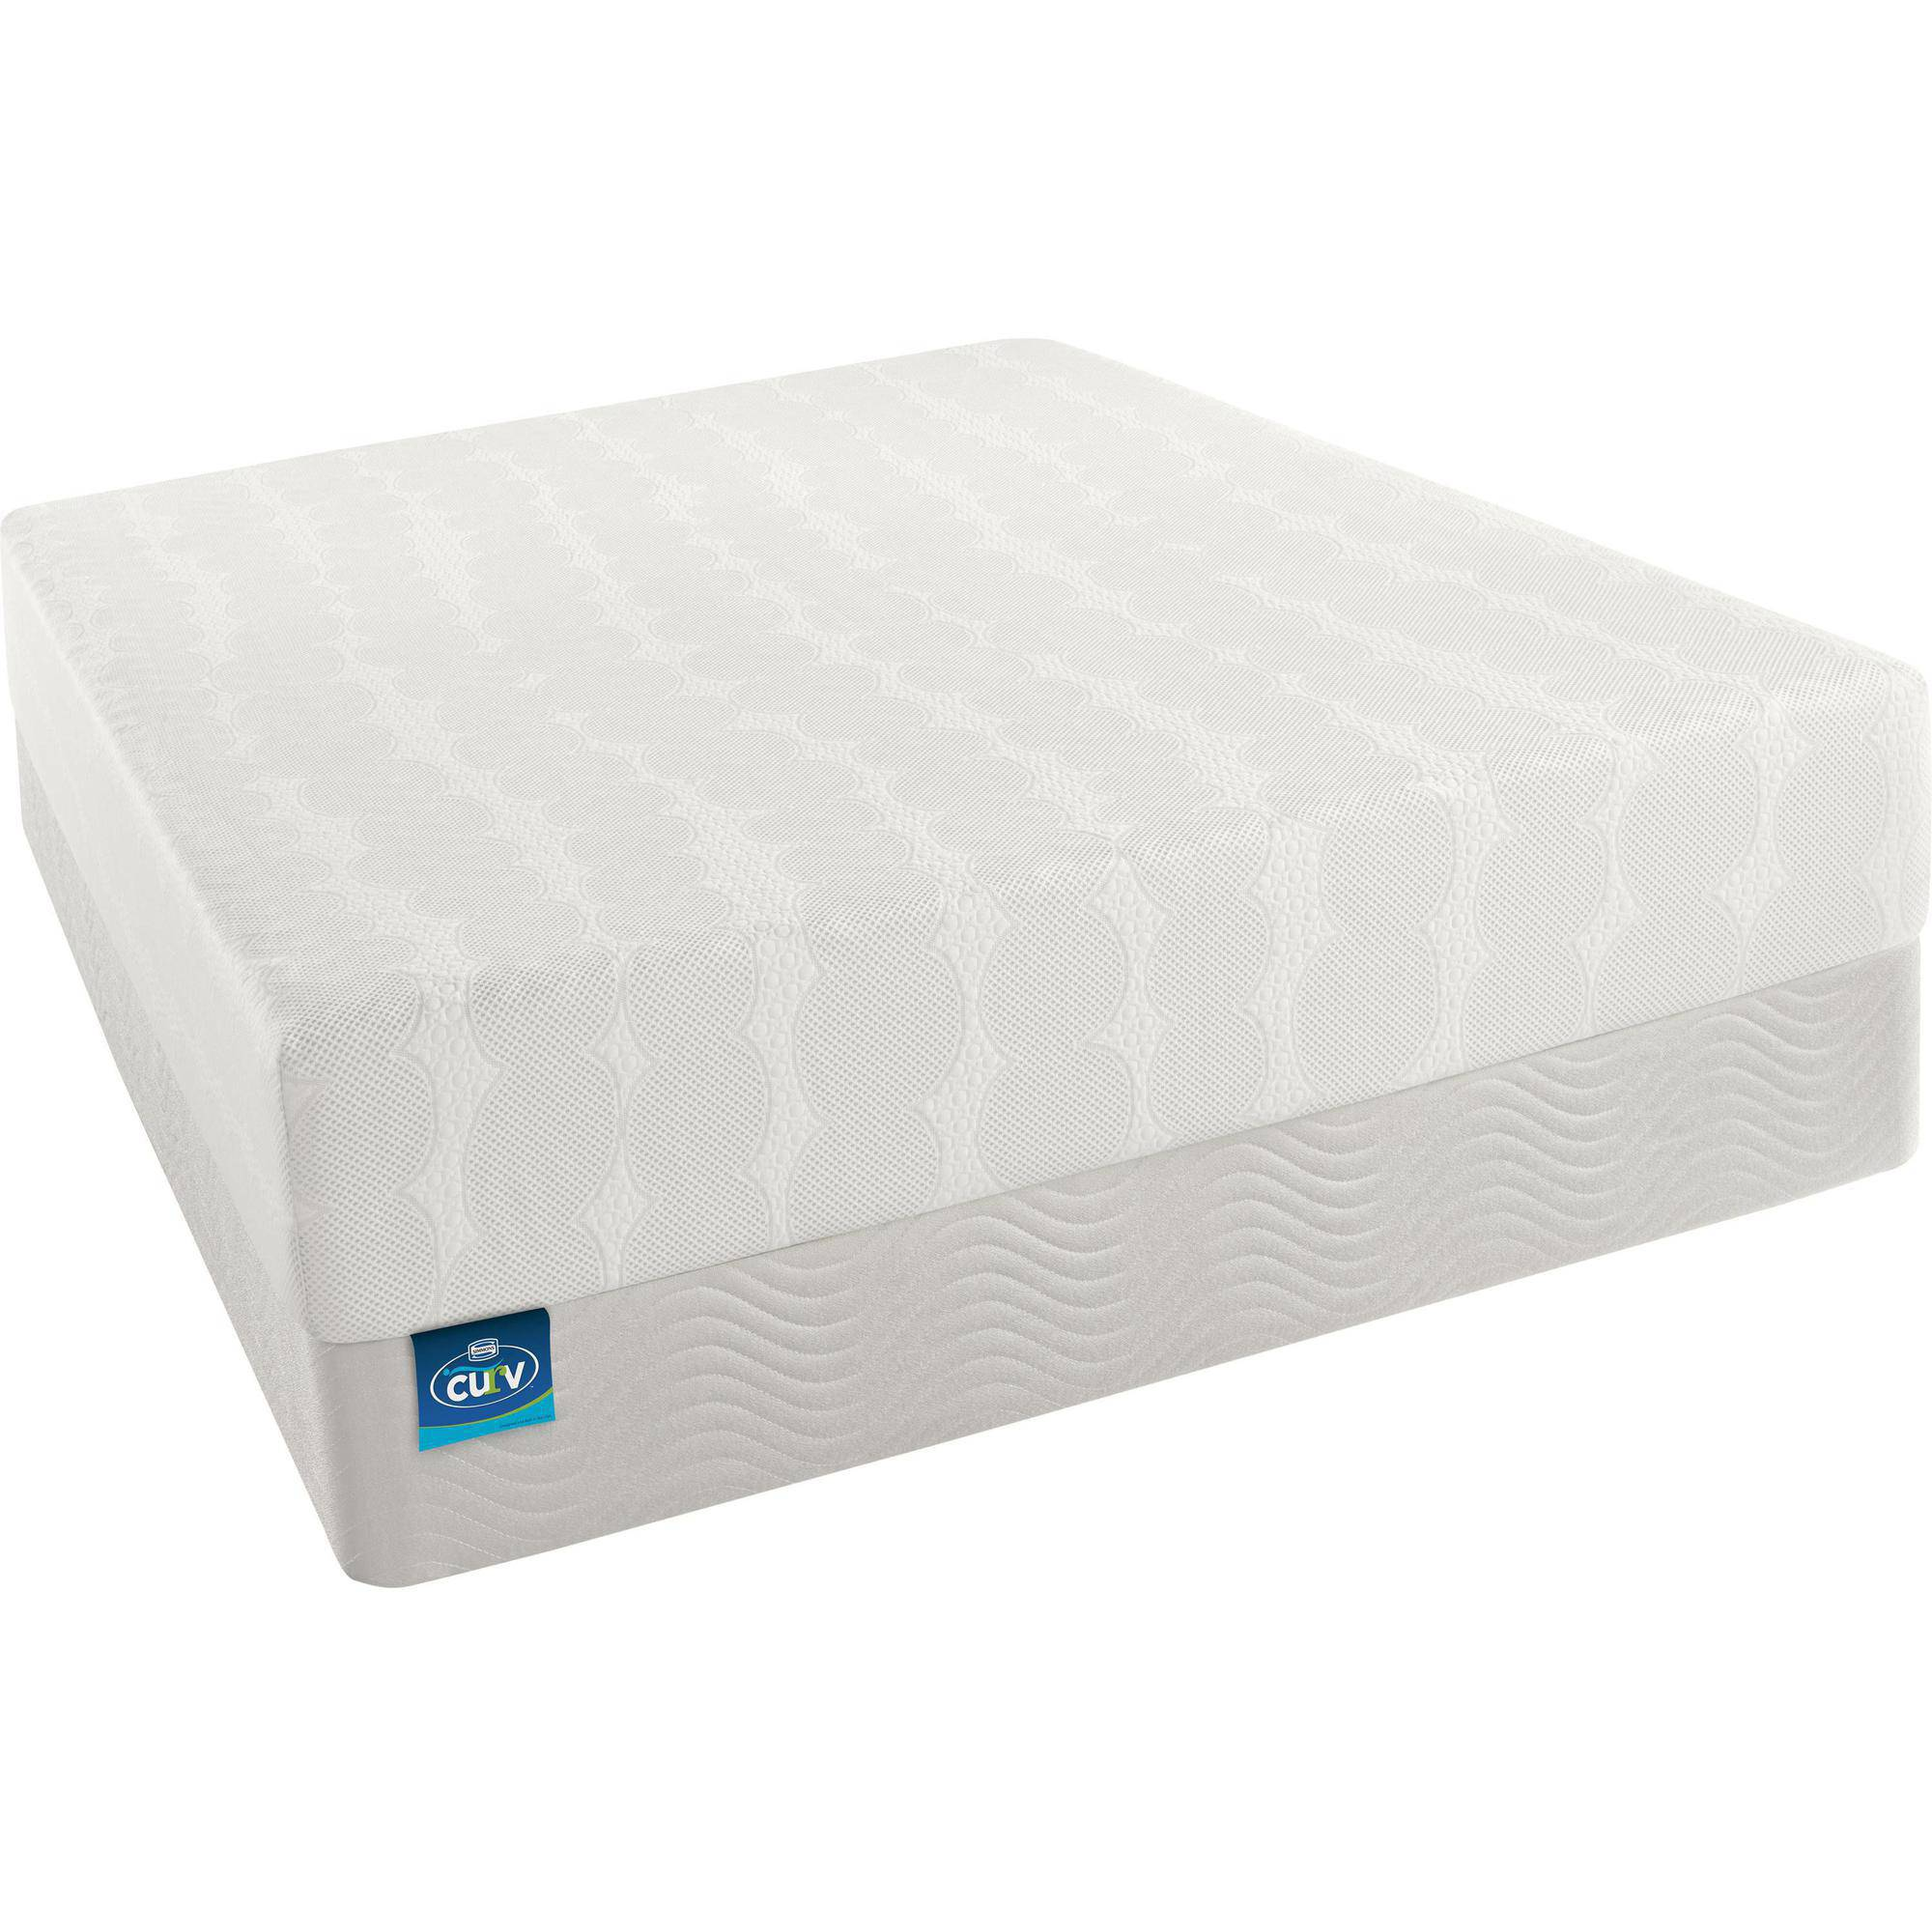 simmons beautyrest curv amazing style memory foam mattress walmartcom